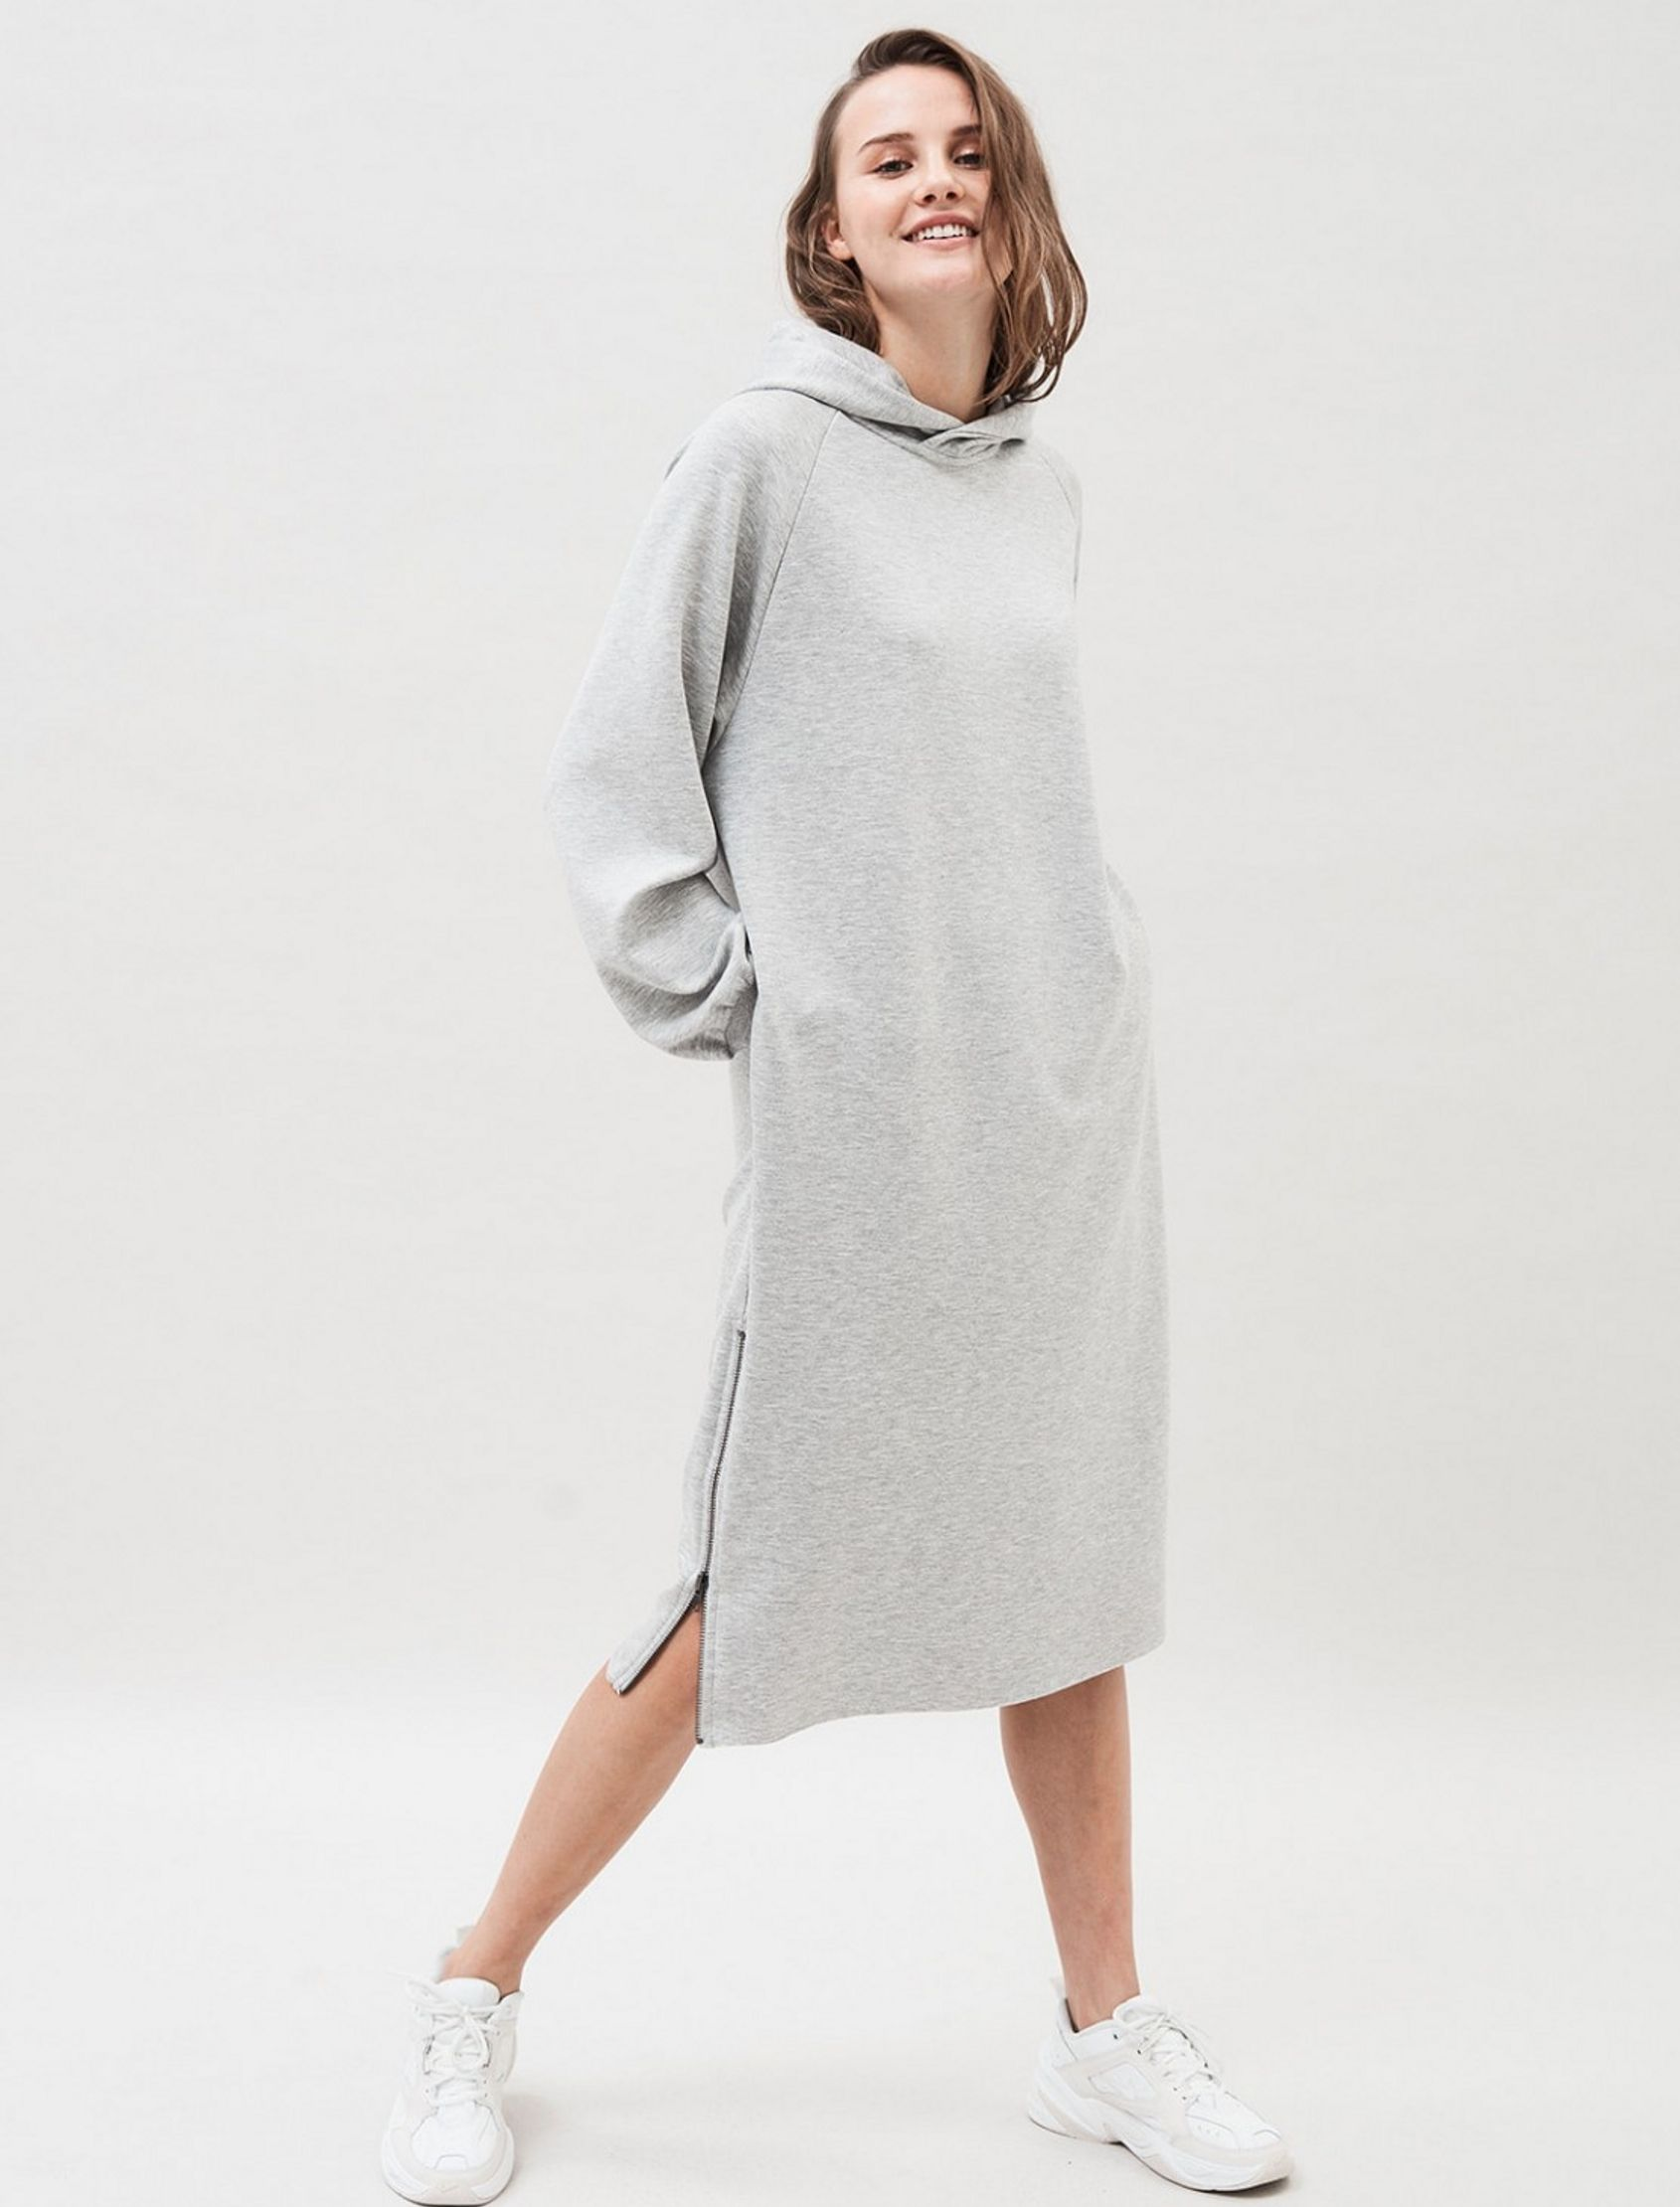 vestido_MosiDress_DR.DENIM_SloaneSquare_01